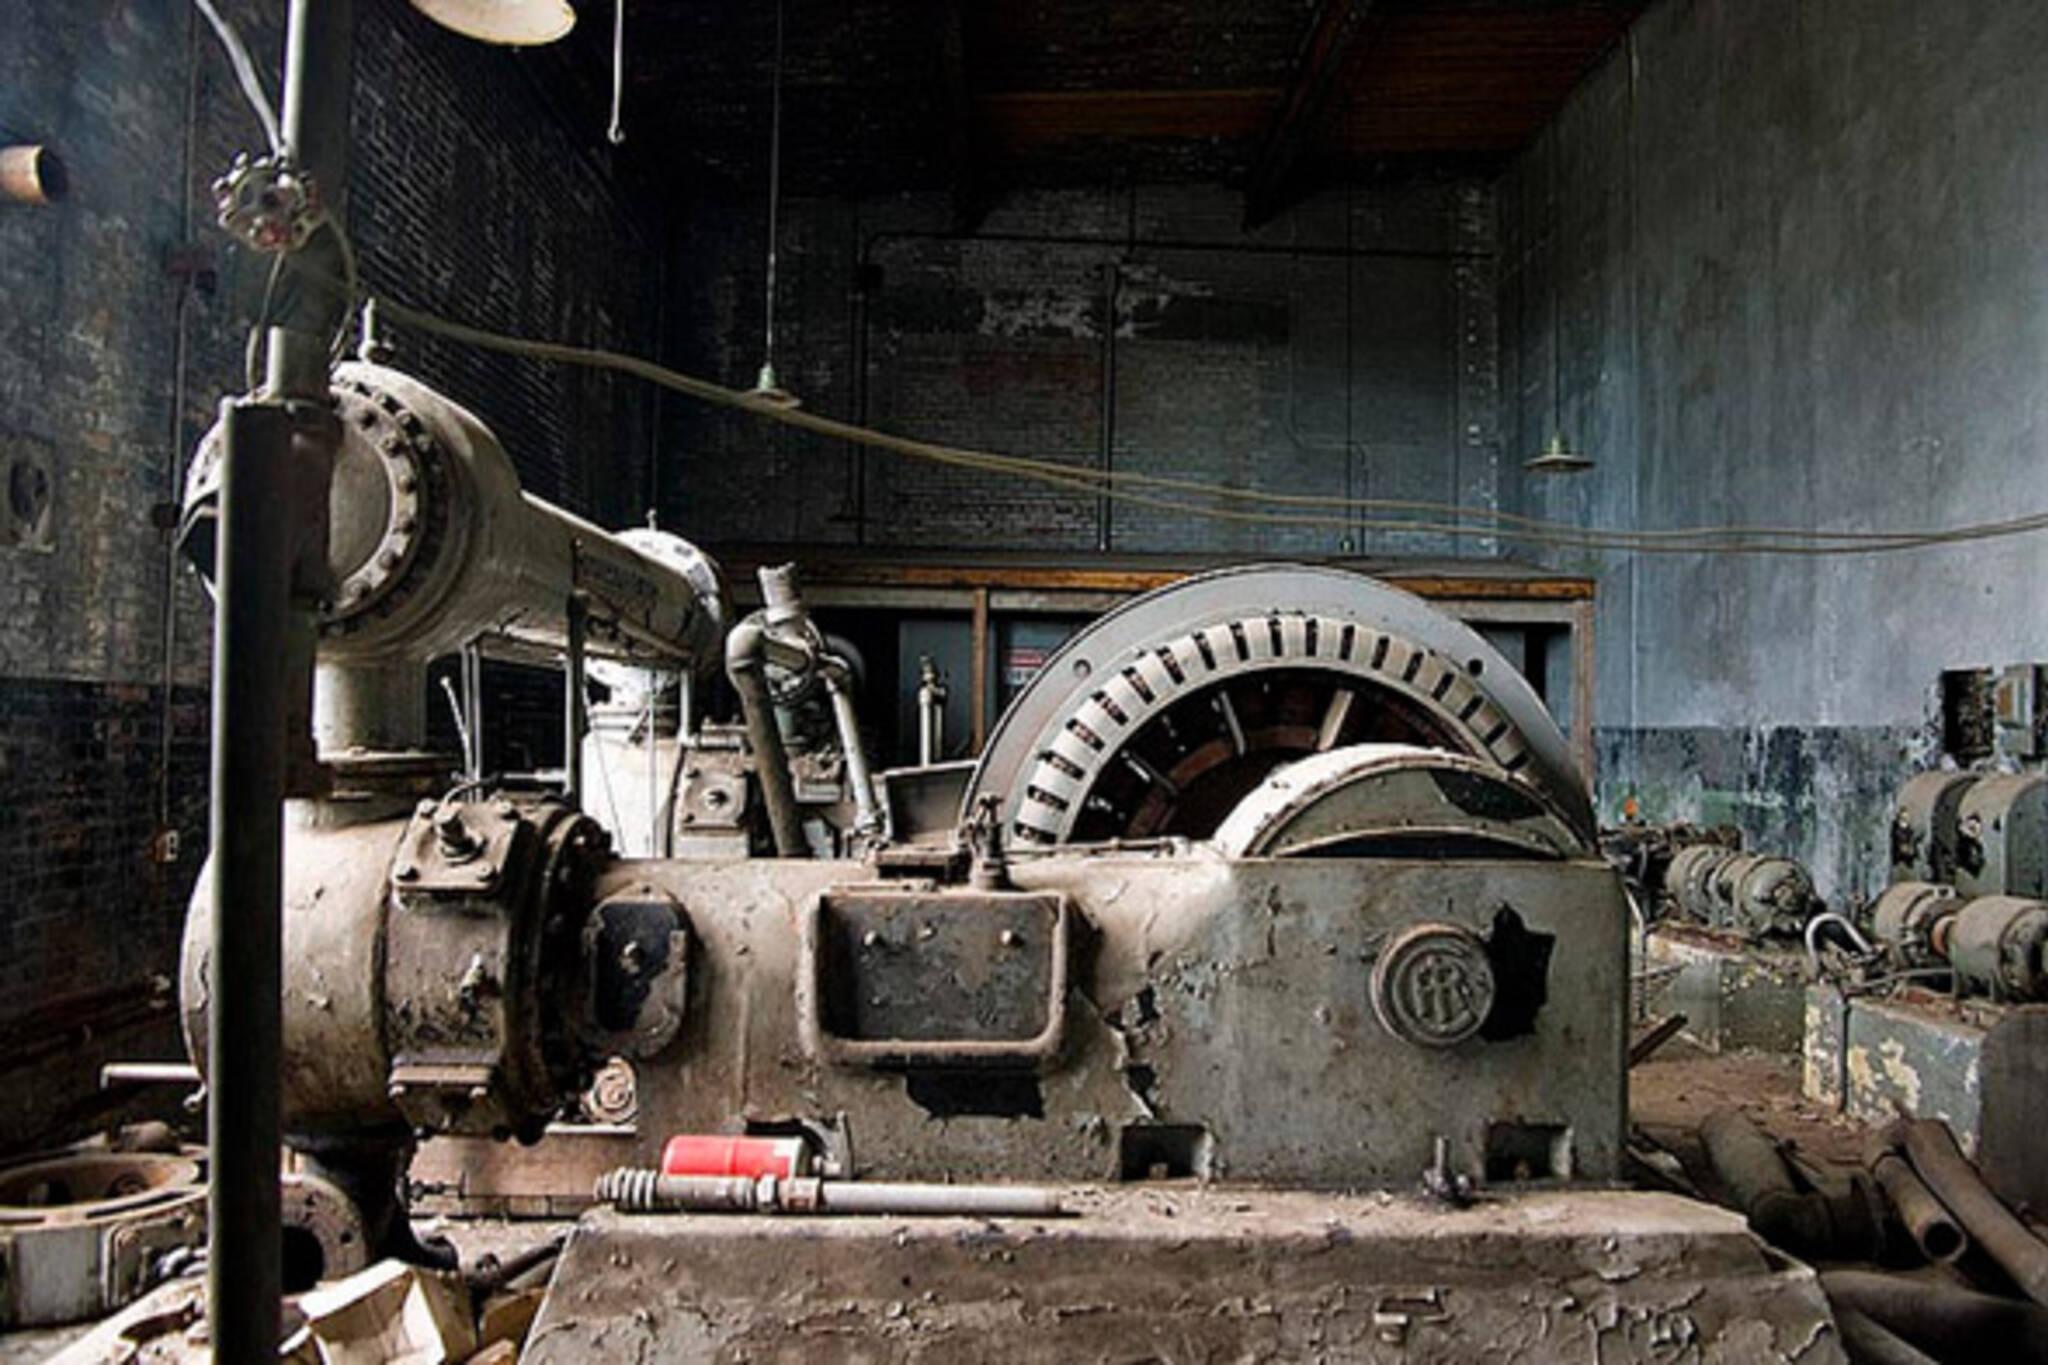 machine, room, old